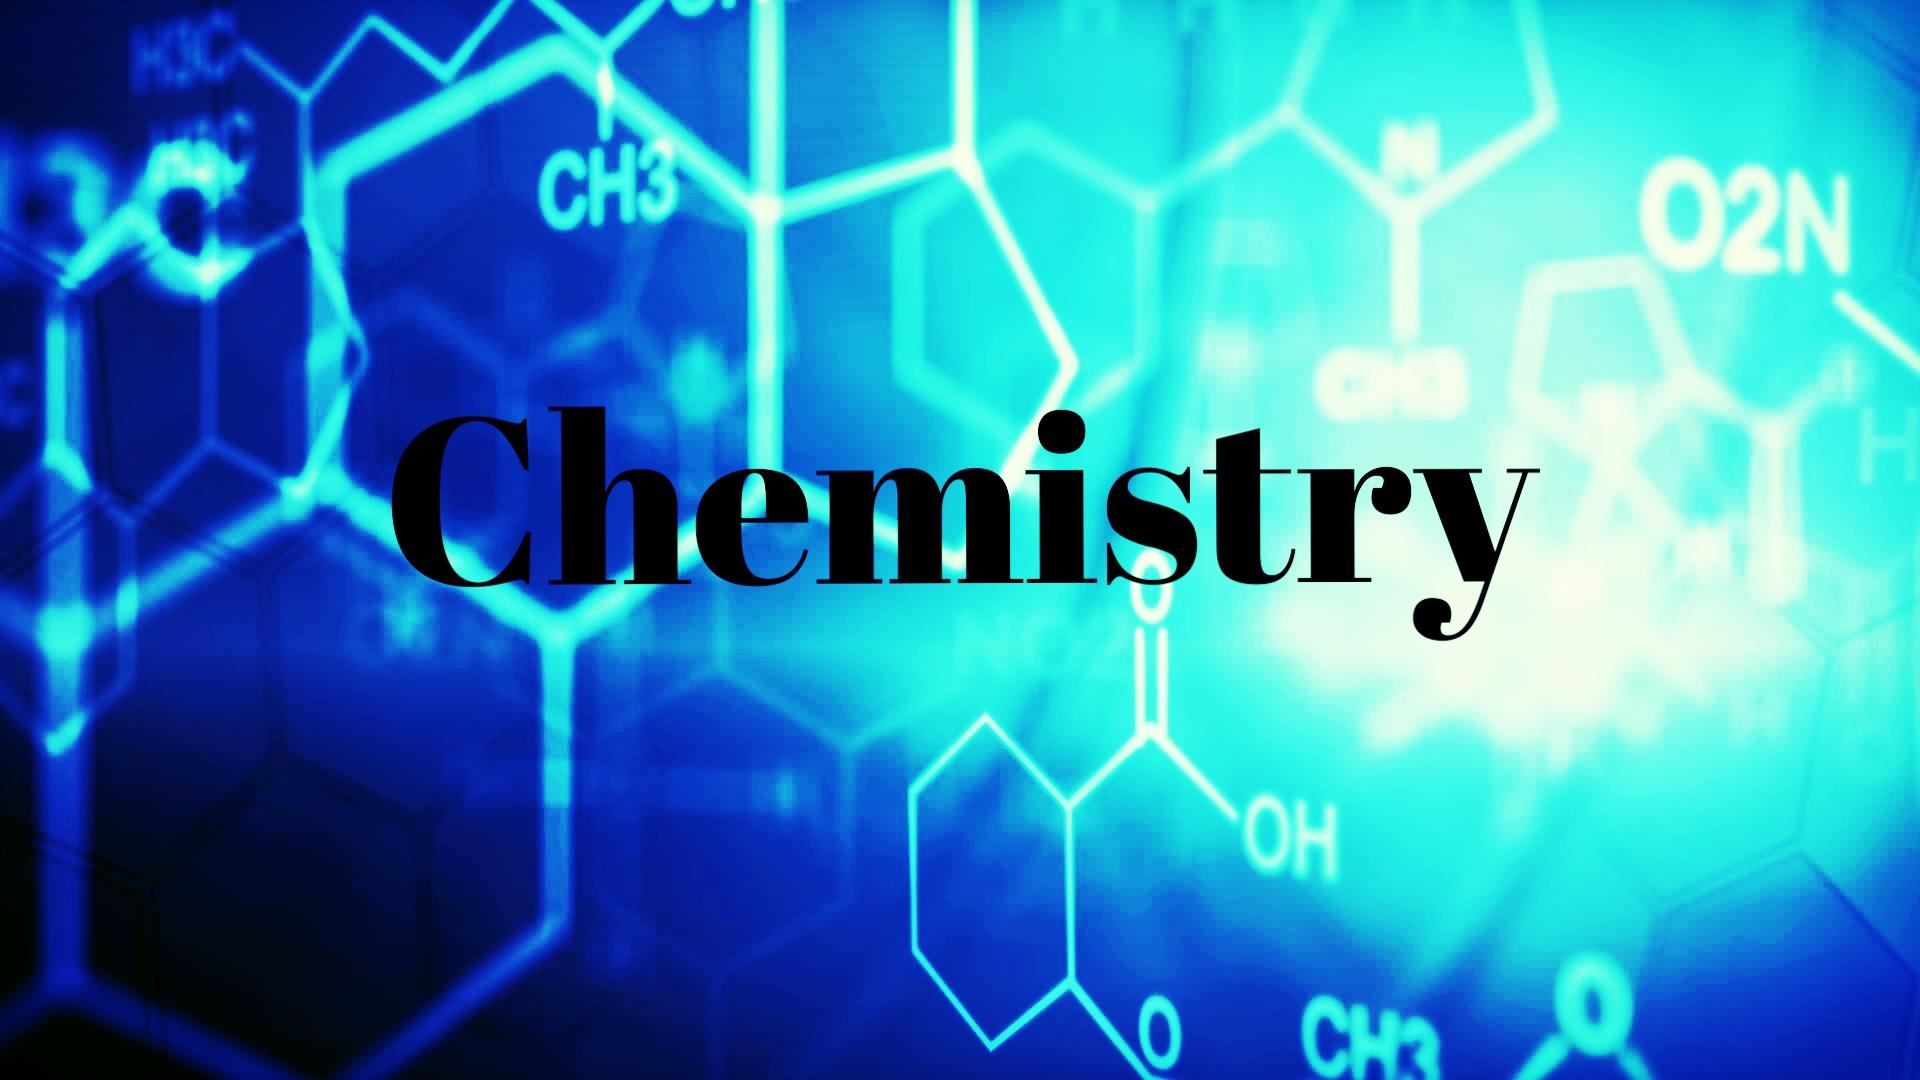 chemistry-desktop-wallpaper-49706-51385-hd-wallpapers.jpg